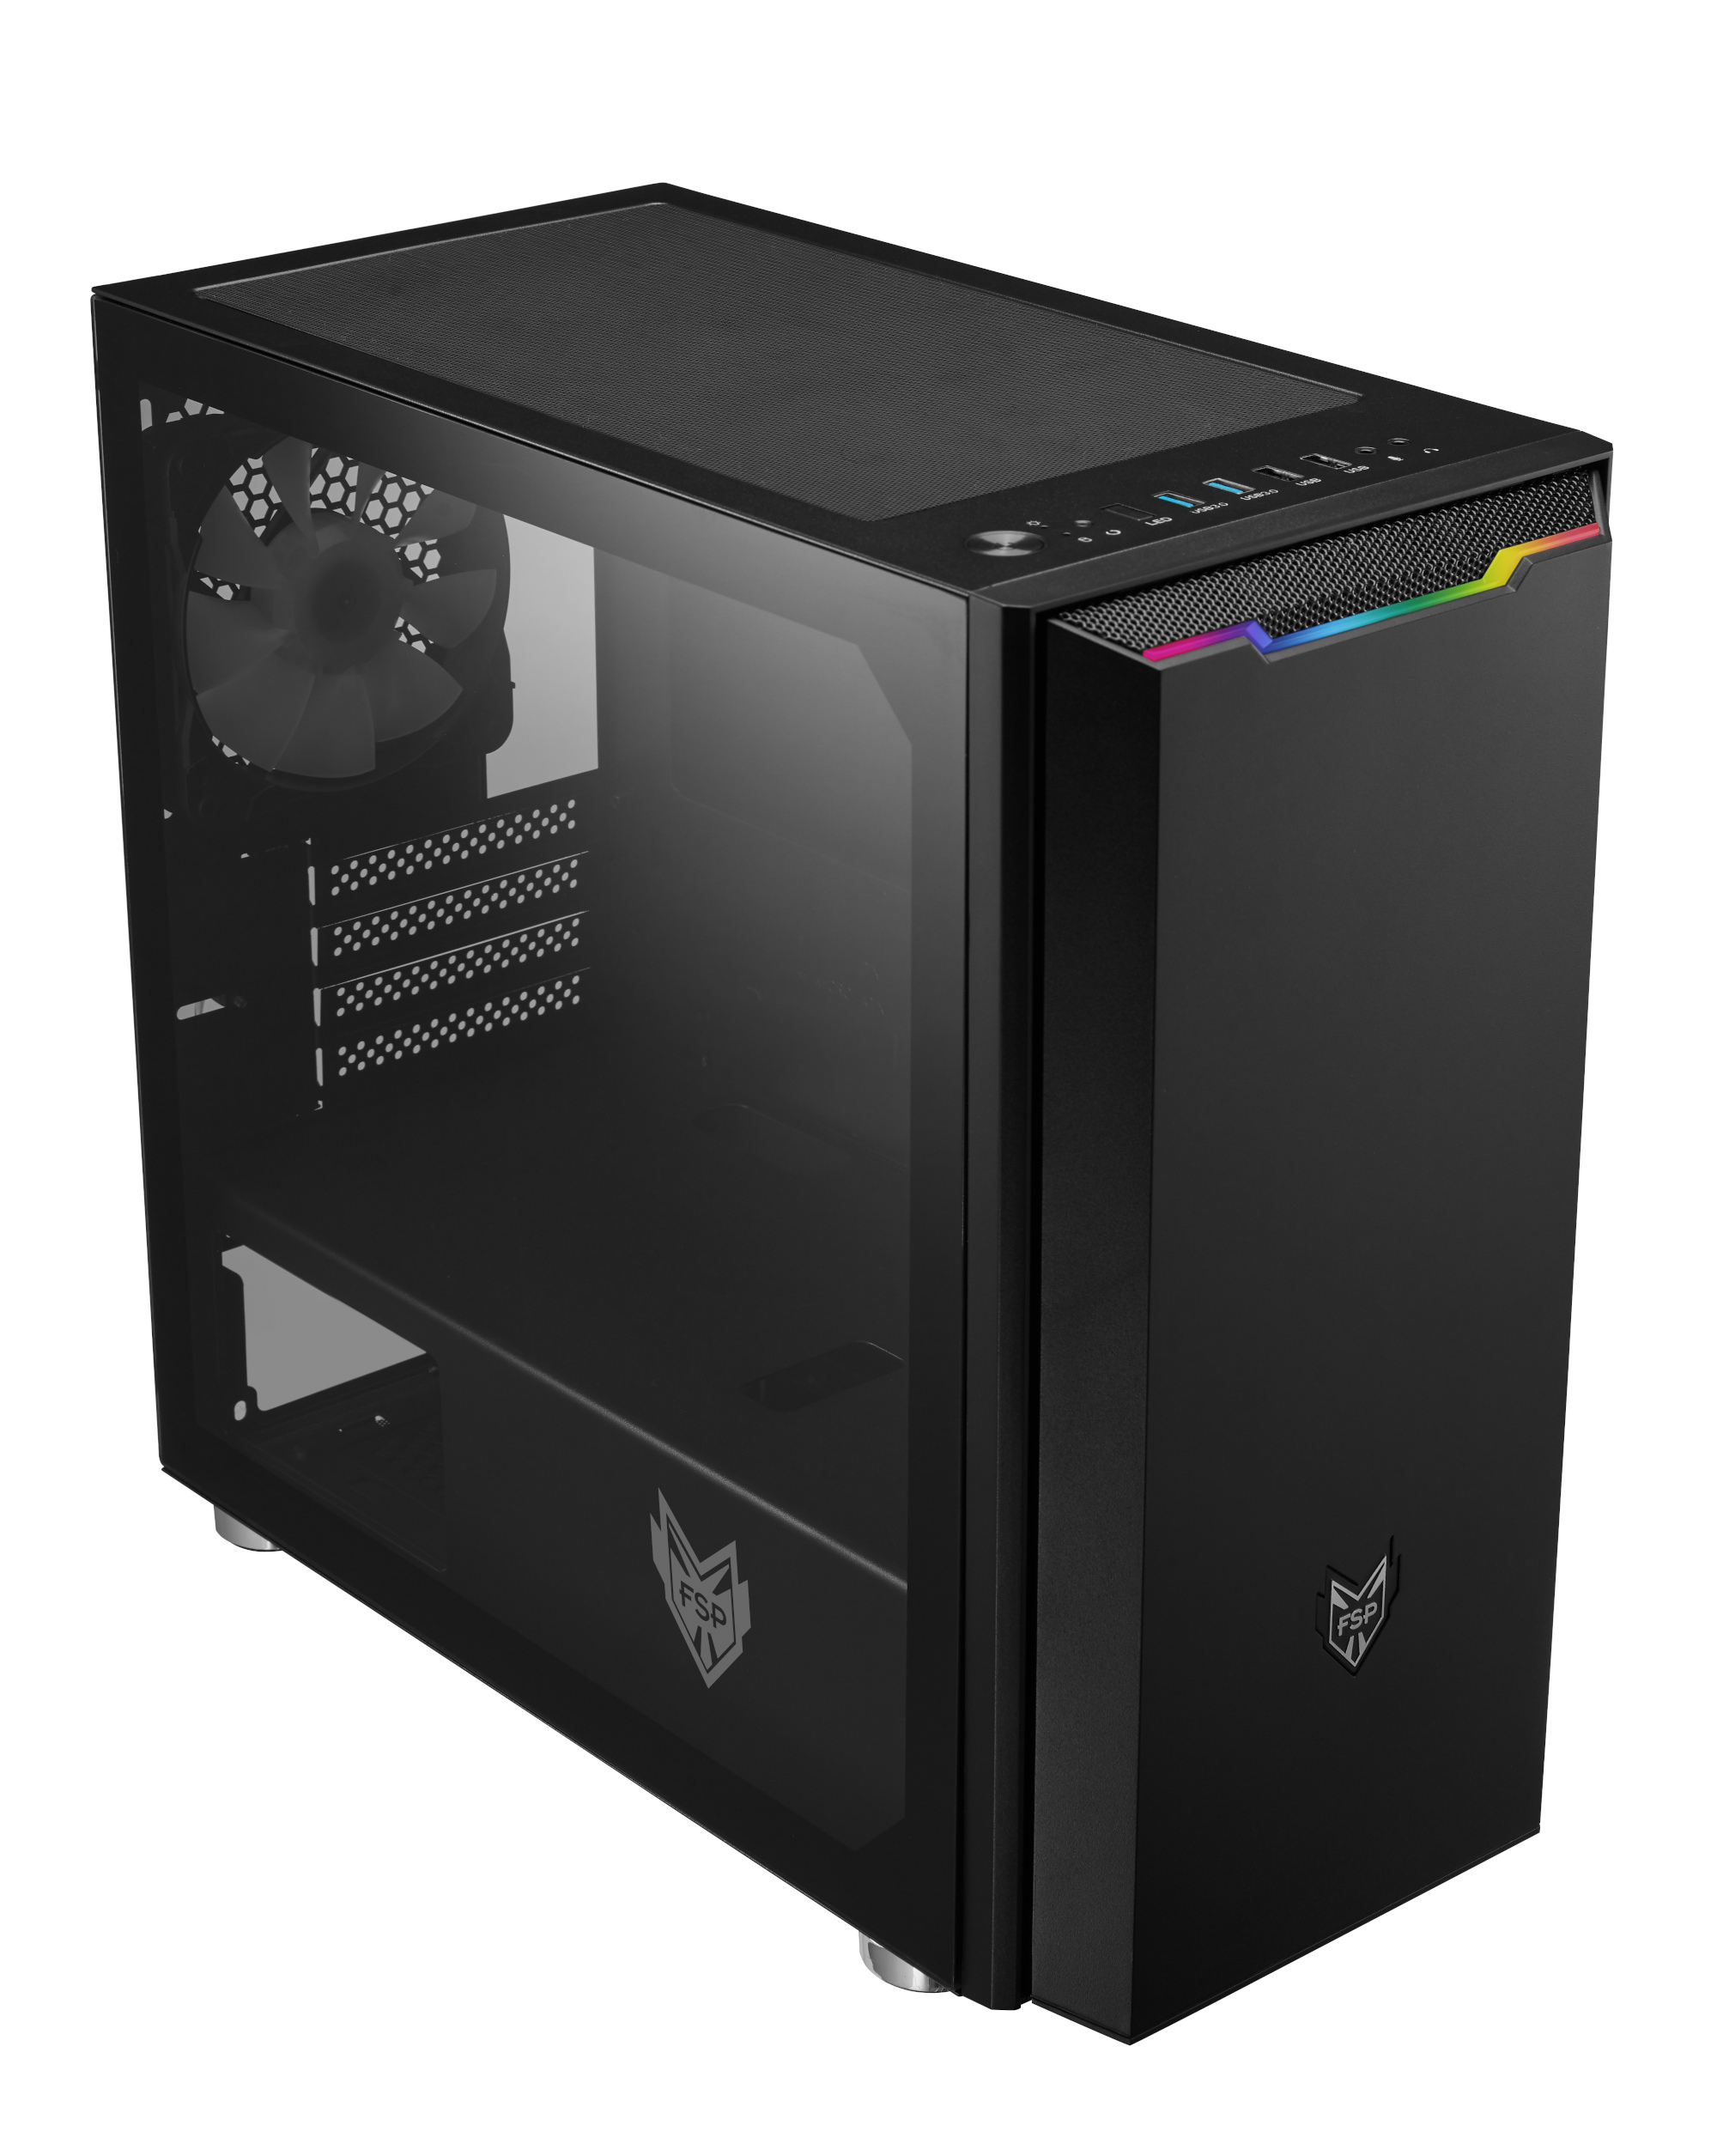 FSP/Fortron ATX Micro CST311 Black, průhledná bočnice - POC0000074